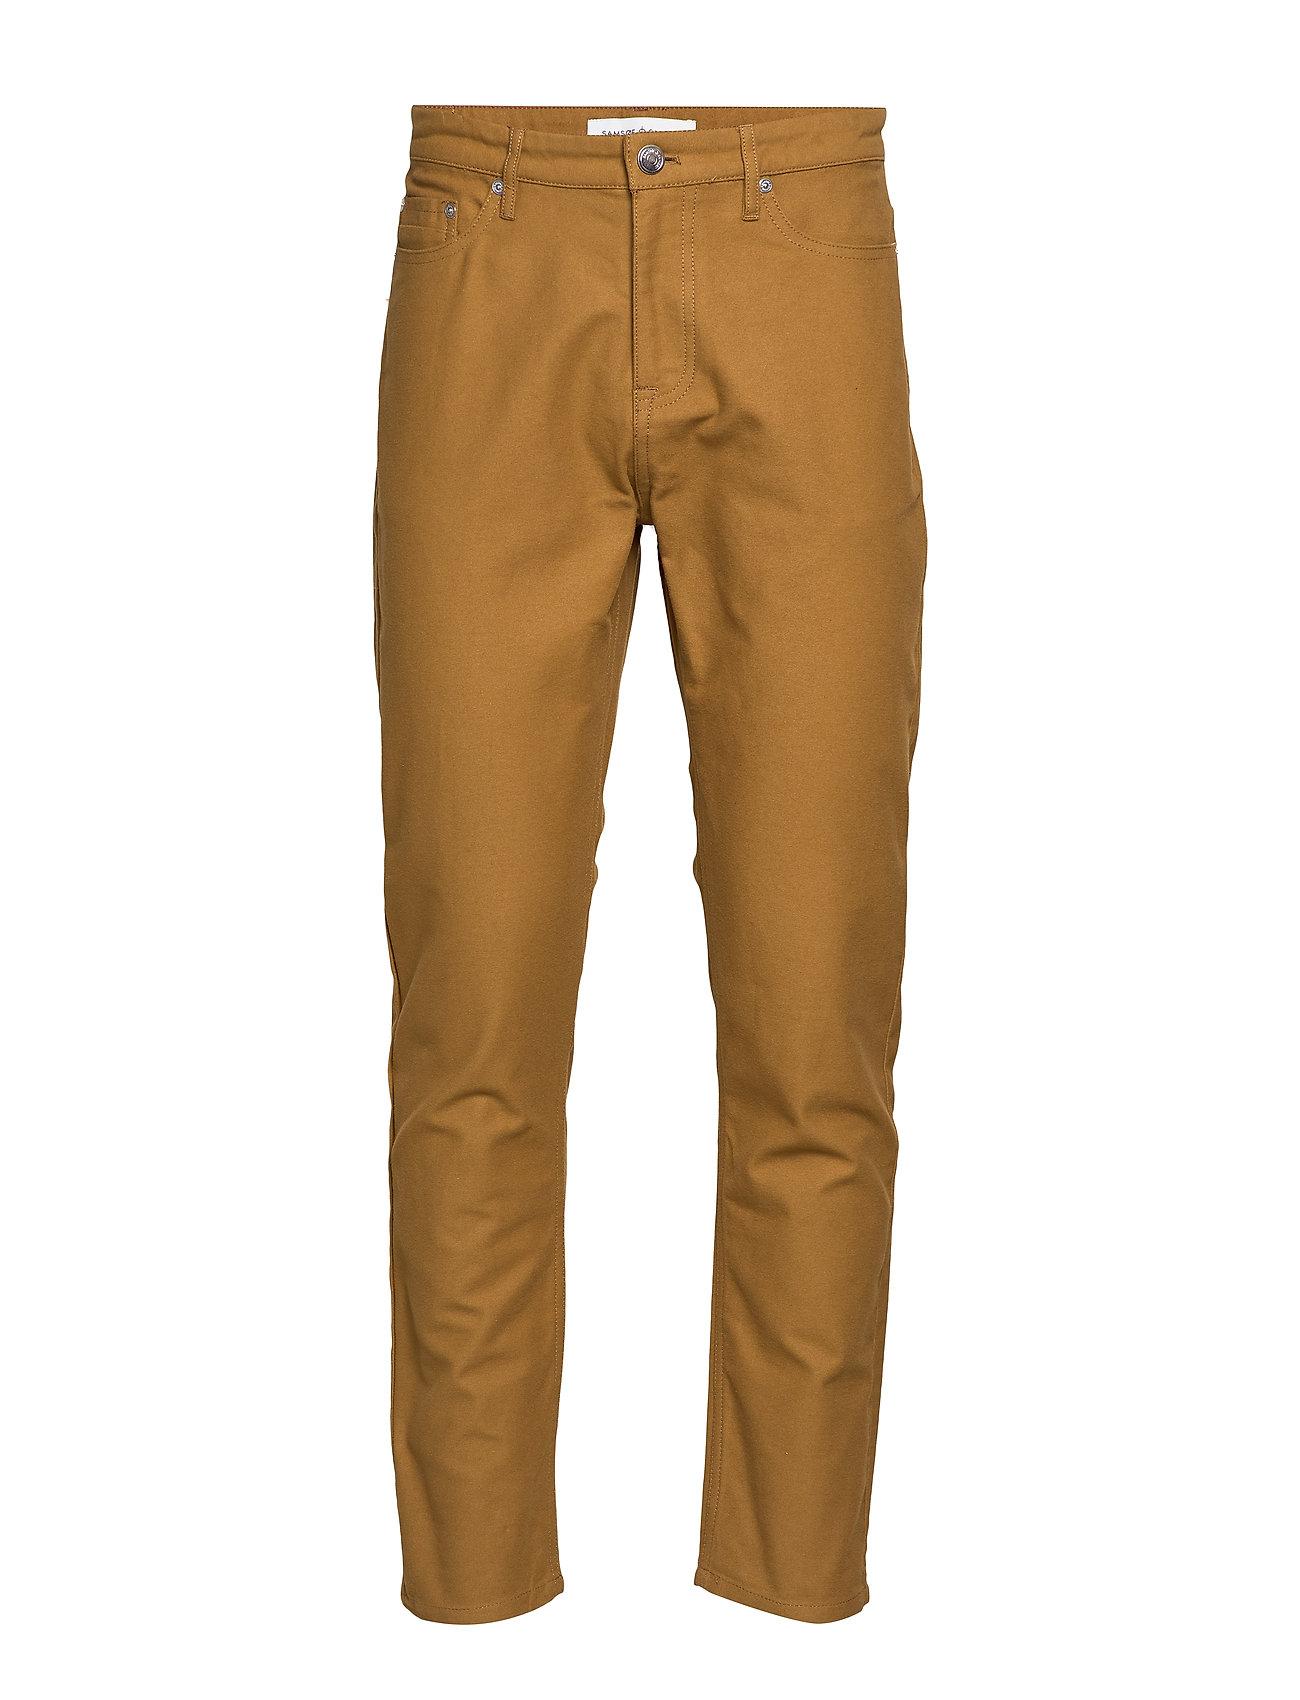 Samsøe & Samsøe Cosmo jeans 11117 - BREEN